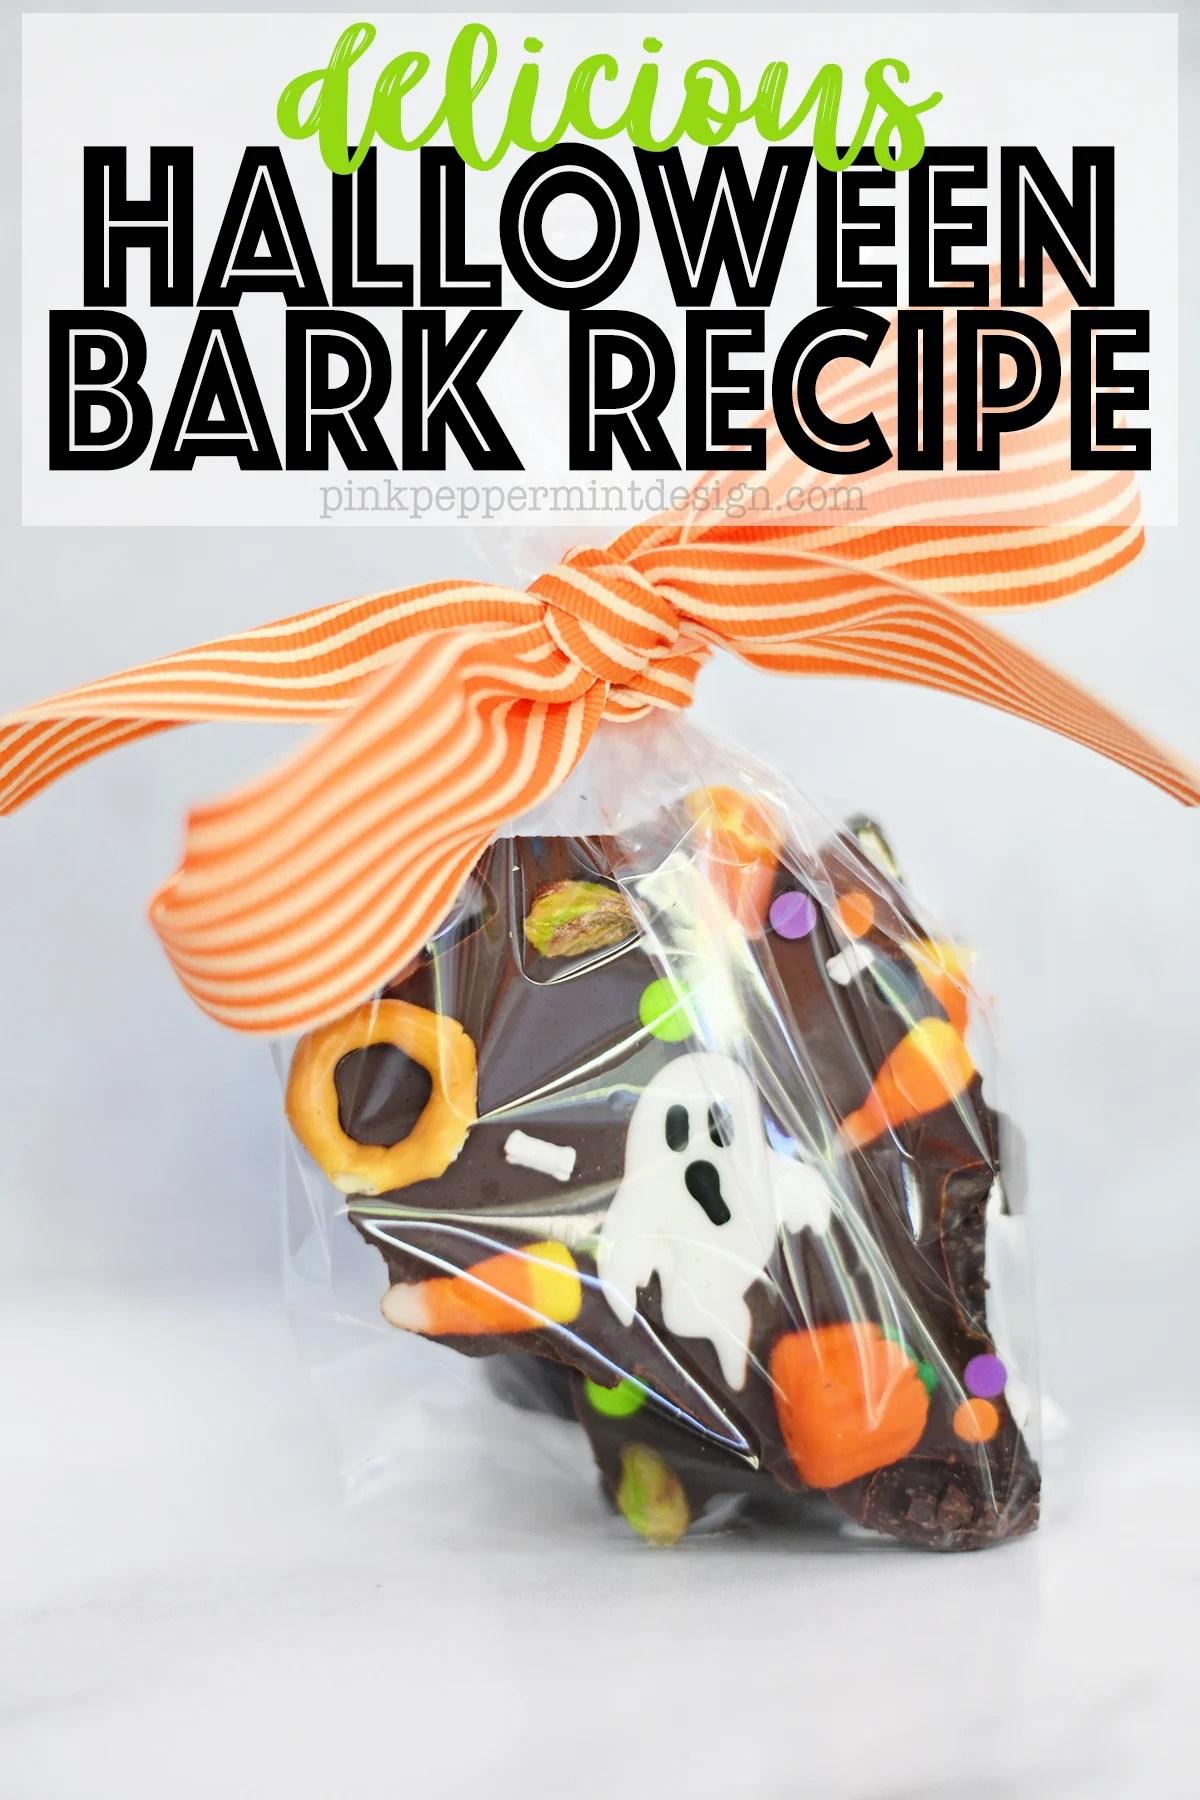 Delicious halloween bark recipe